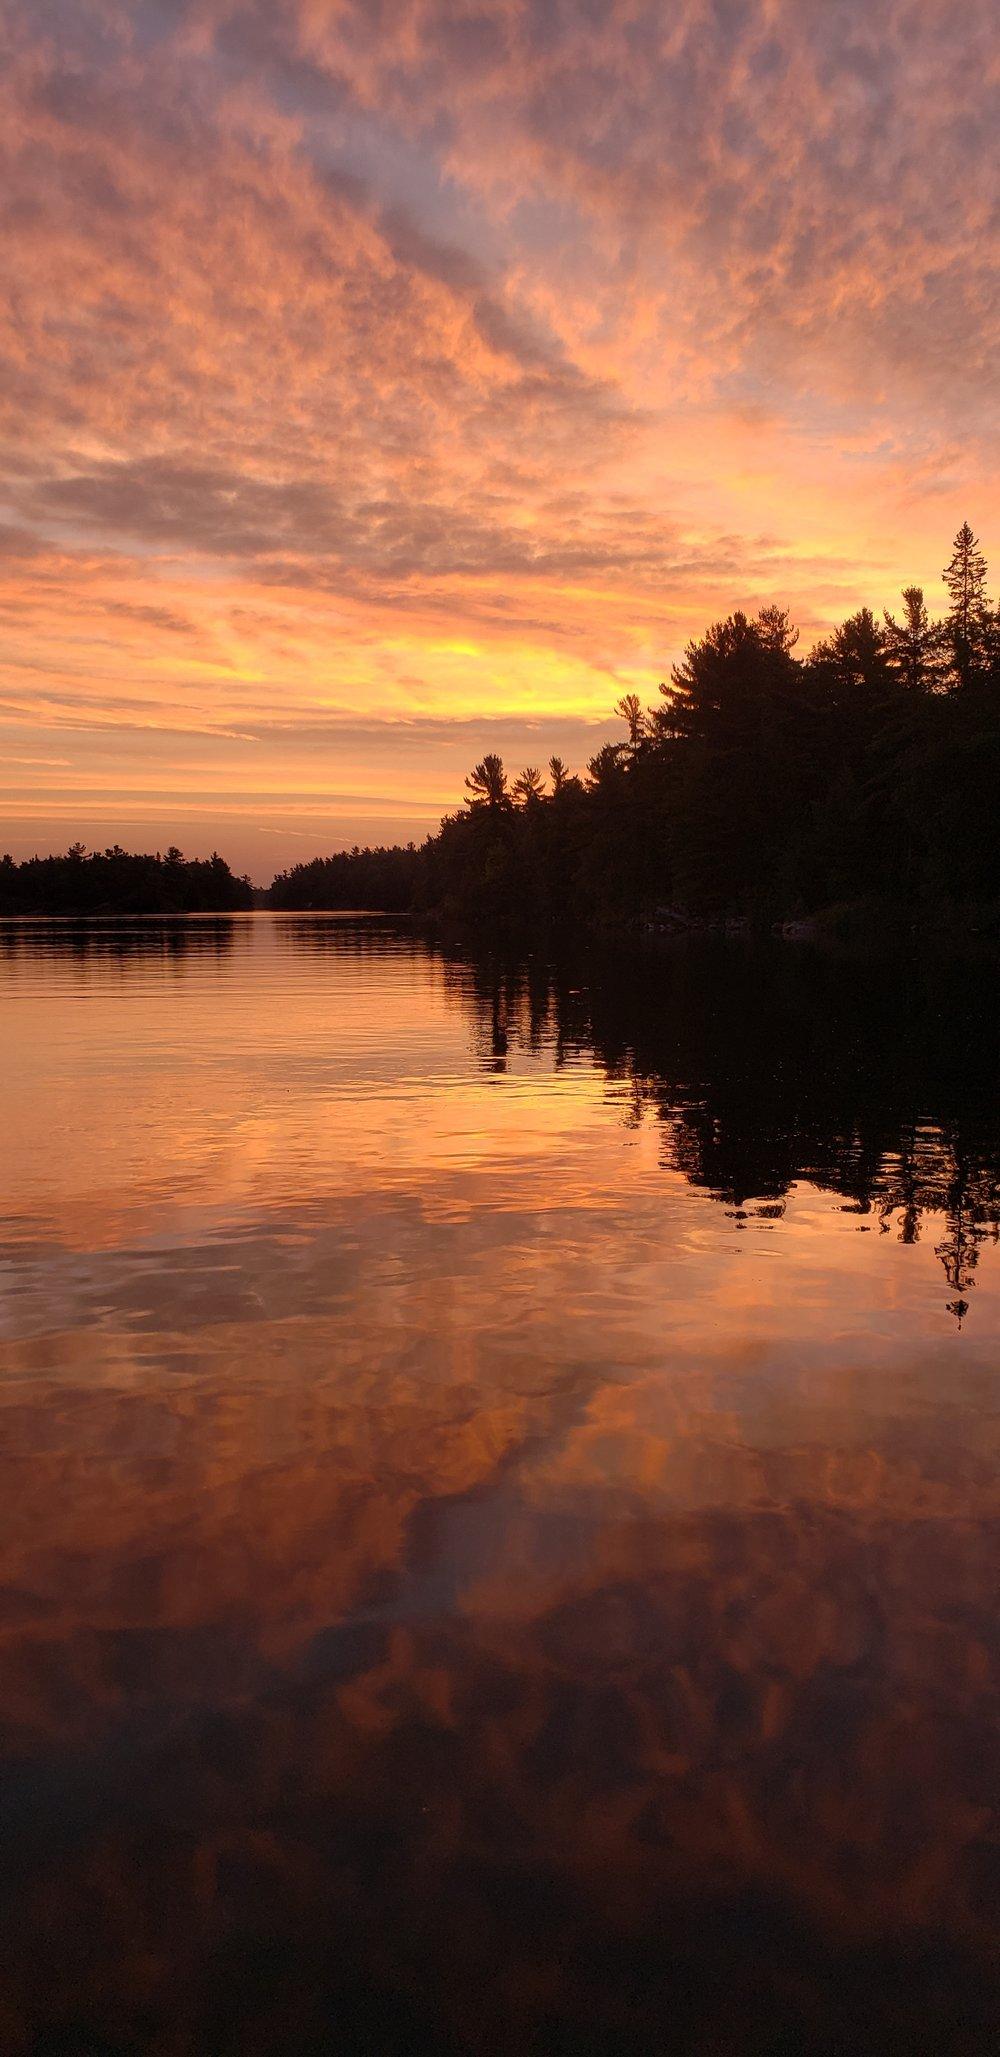 sunrisesunset #3.jpg